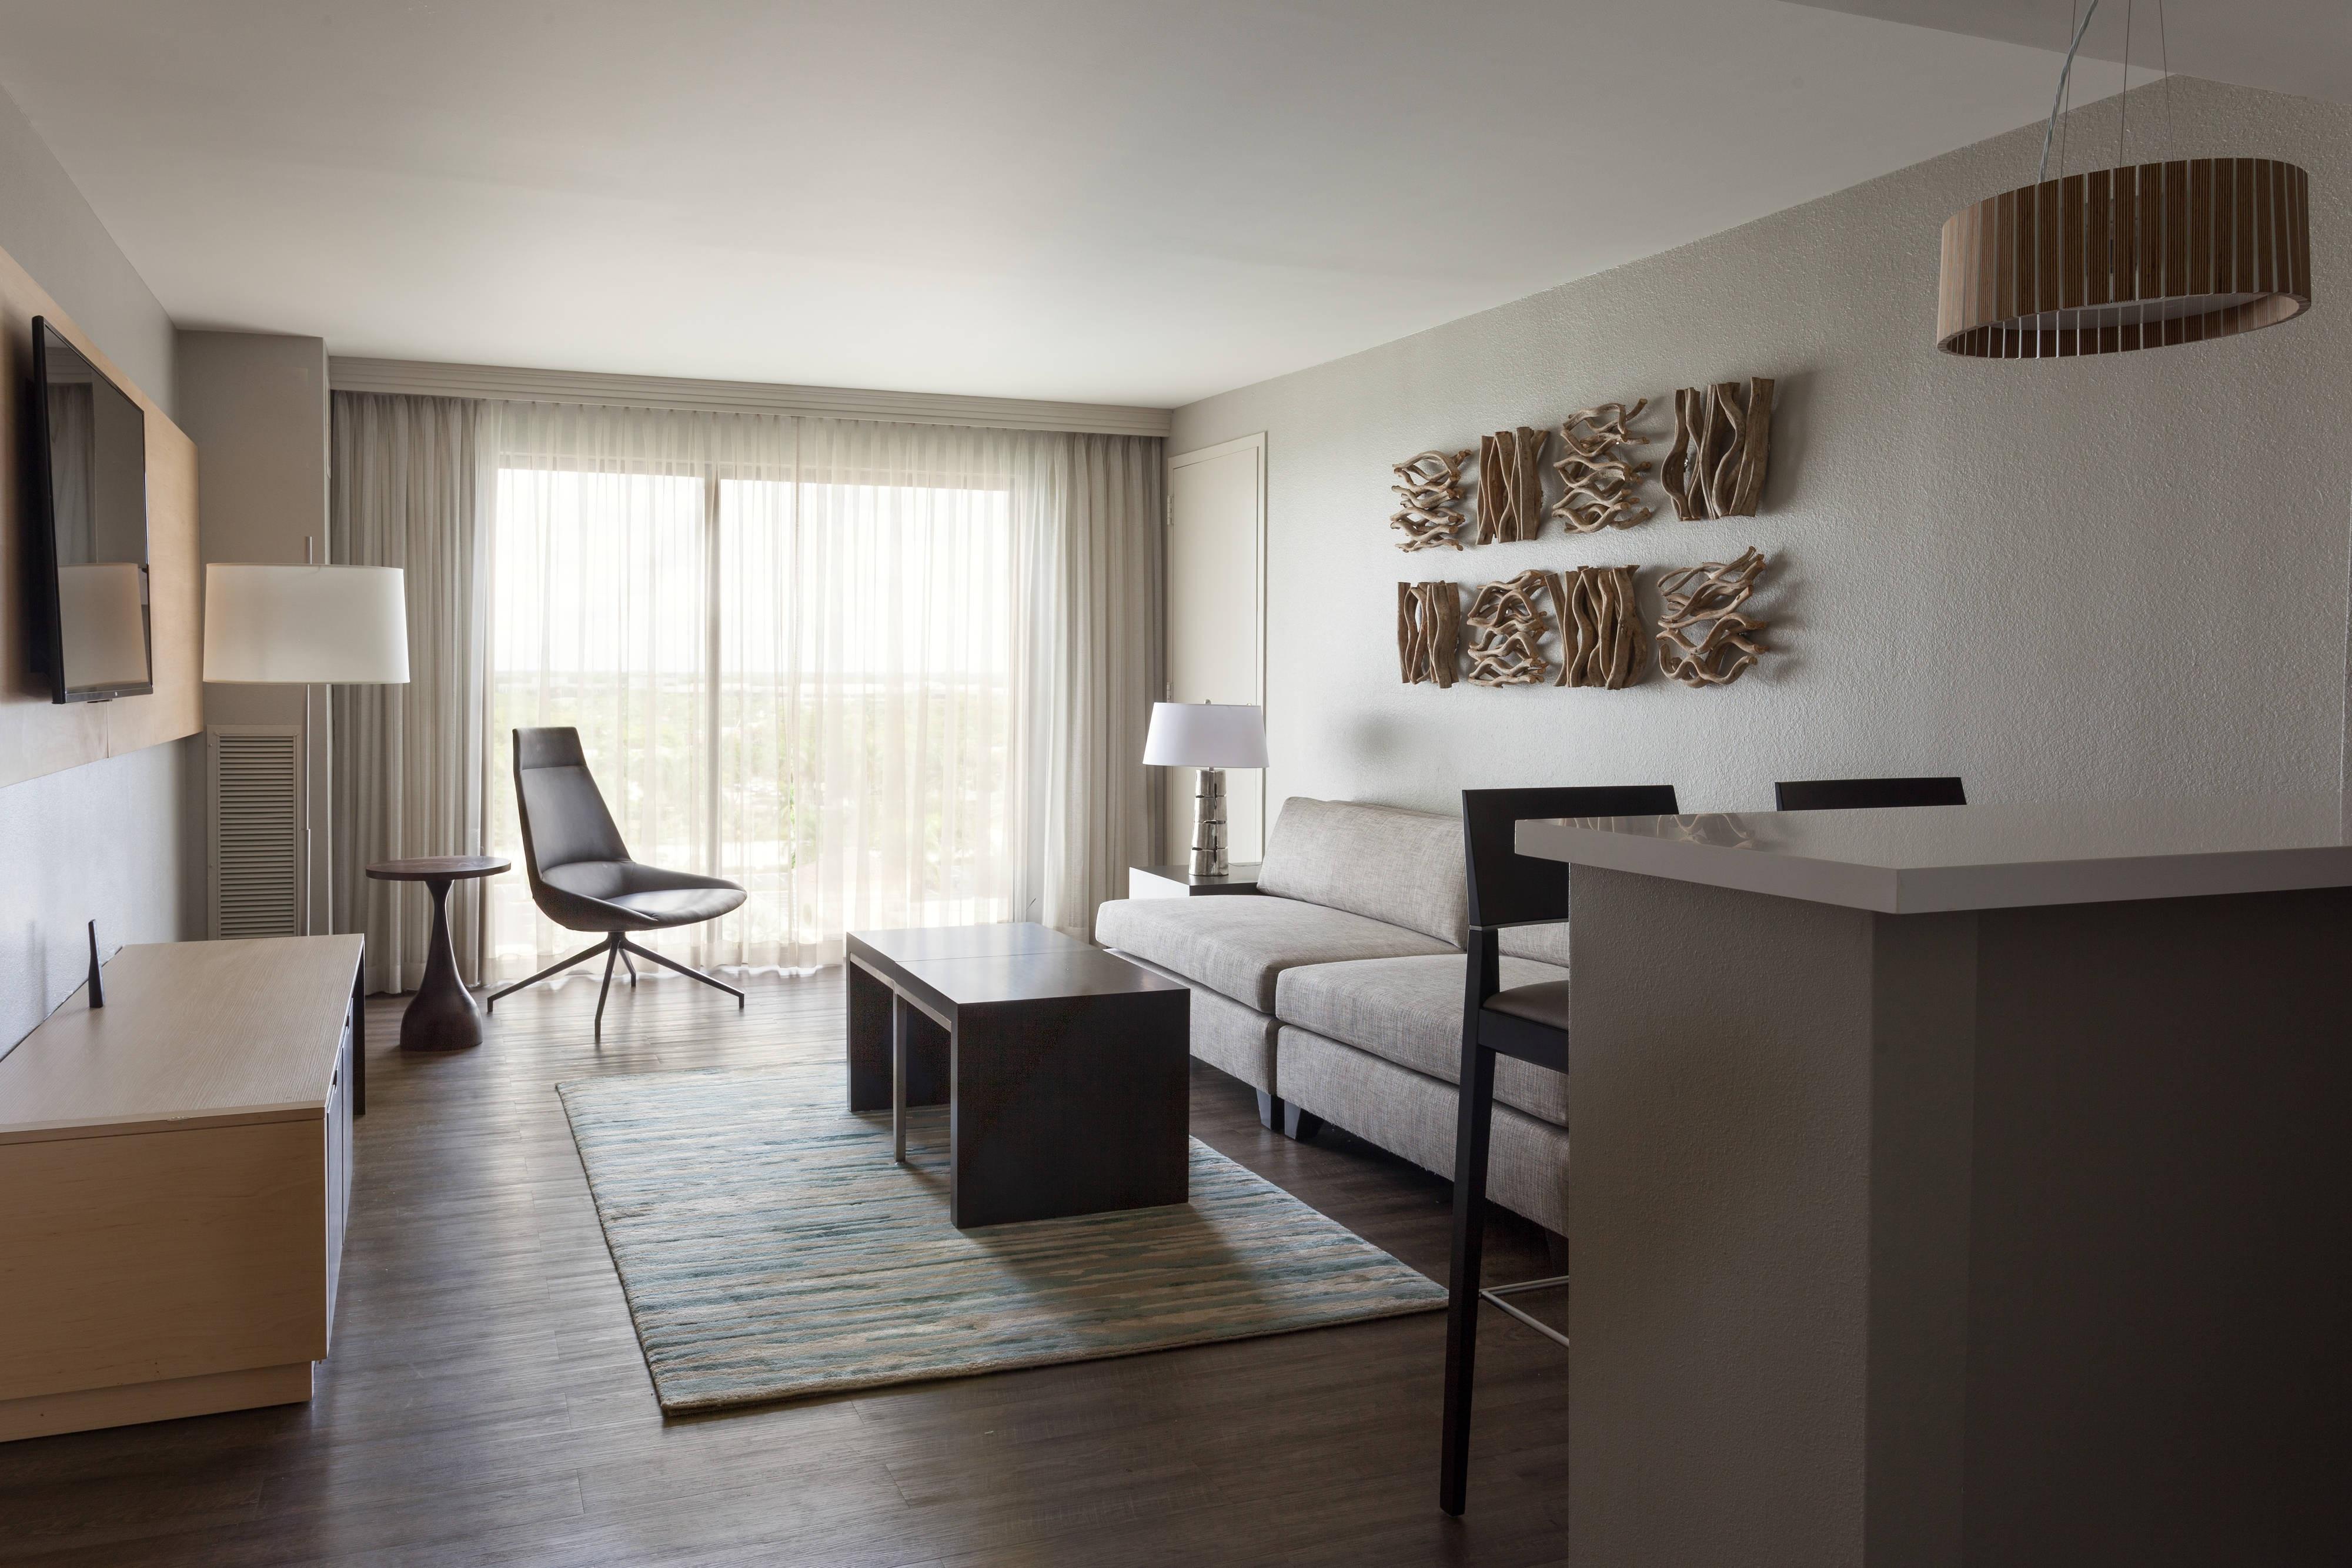 Boca Raton Hotel Rooms Boca Raton Marriott At Boca Center